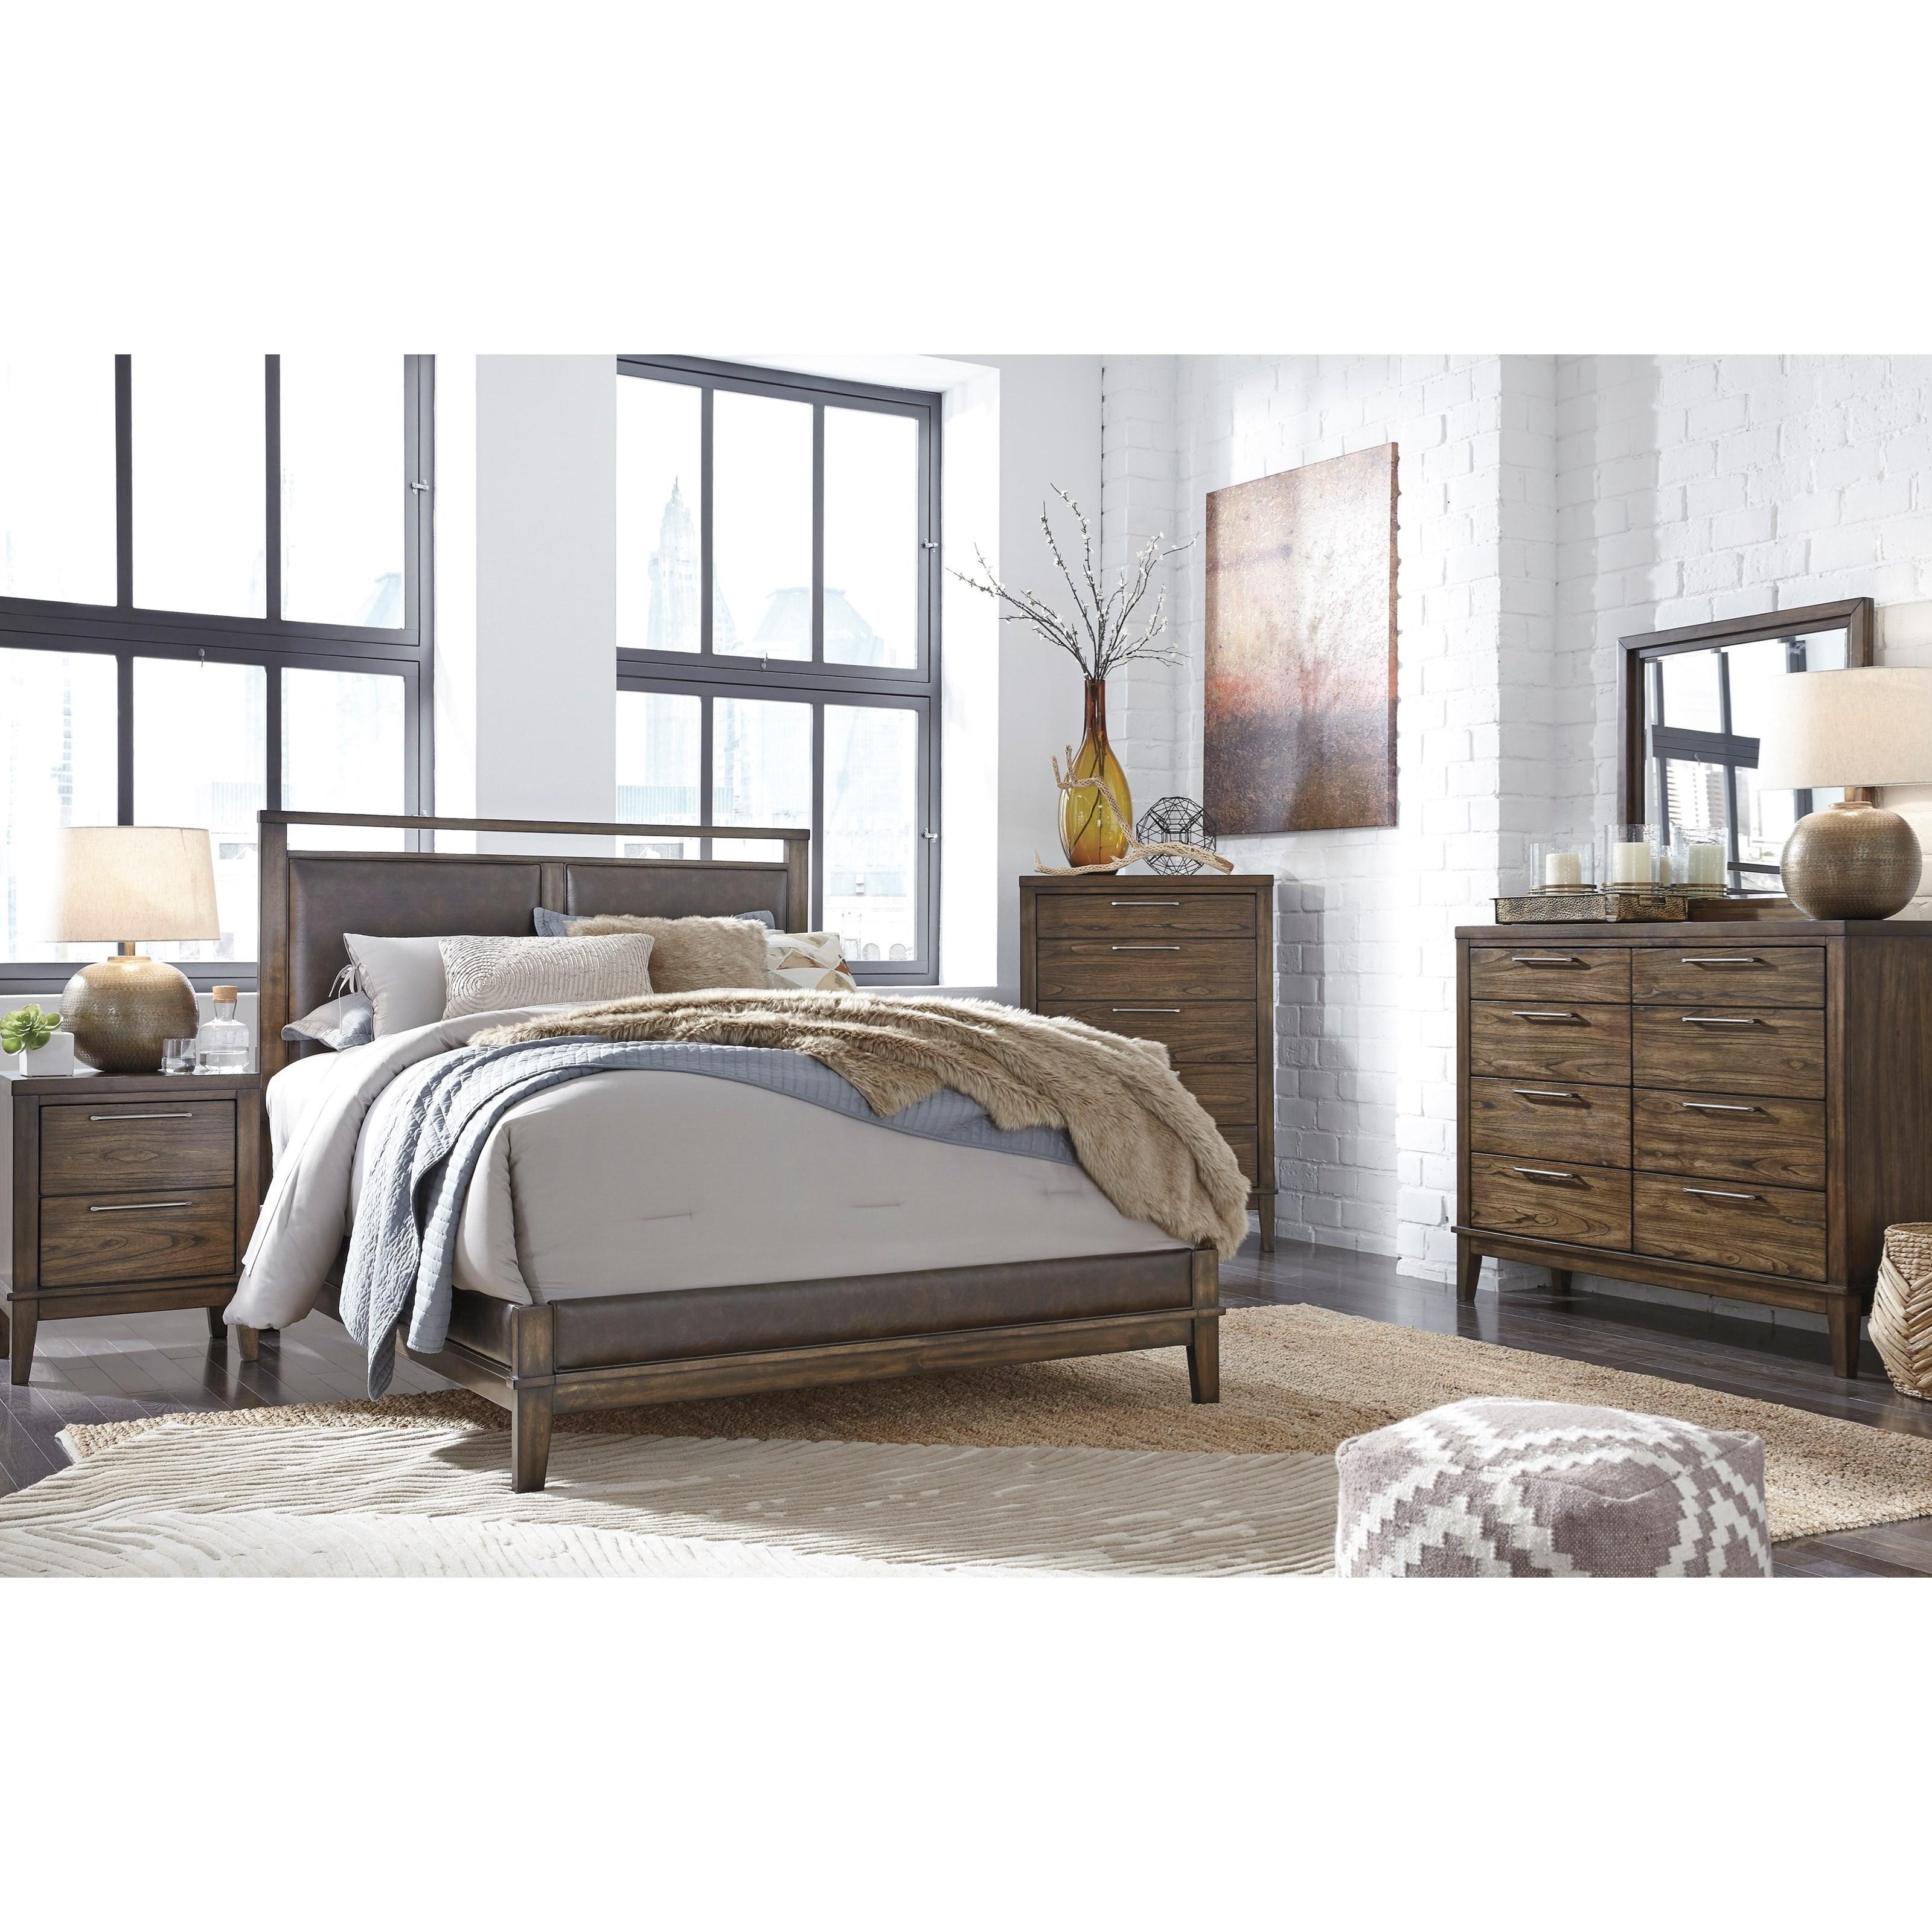 Signature Design by Ashley Zilmar King Bedroom Group - Item Number: B548 K Bedroom Group 1